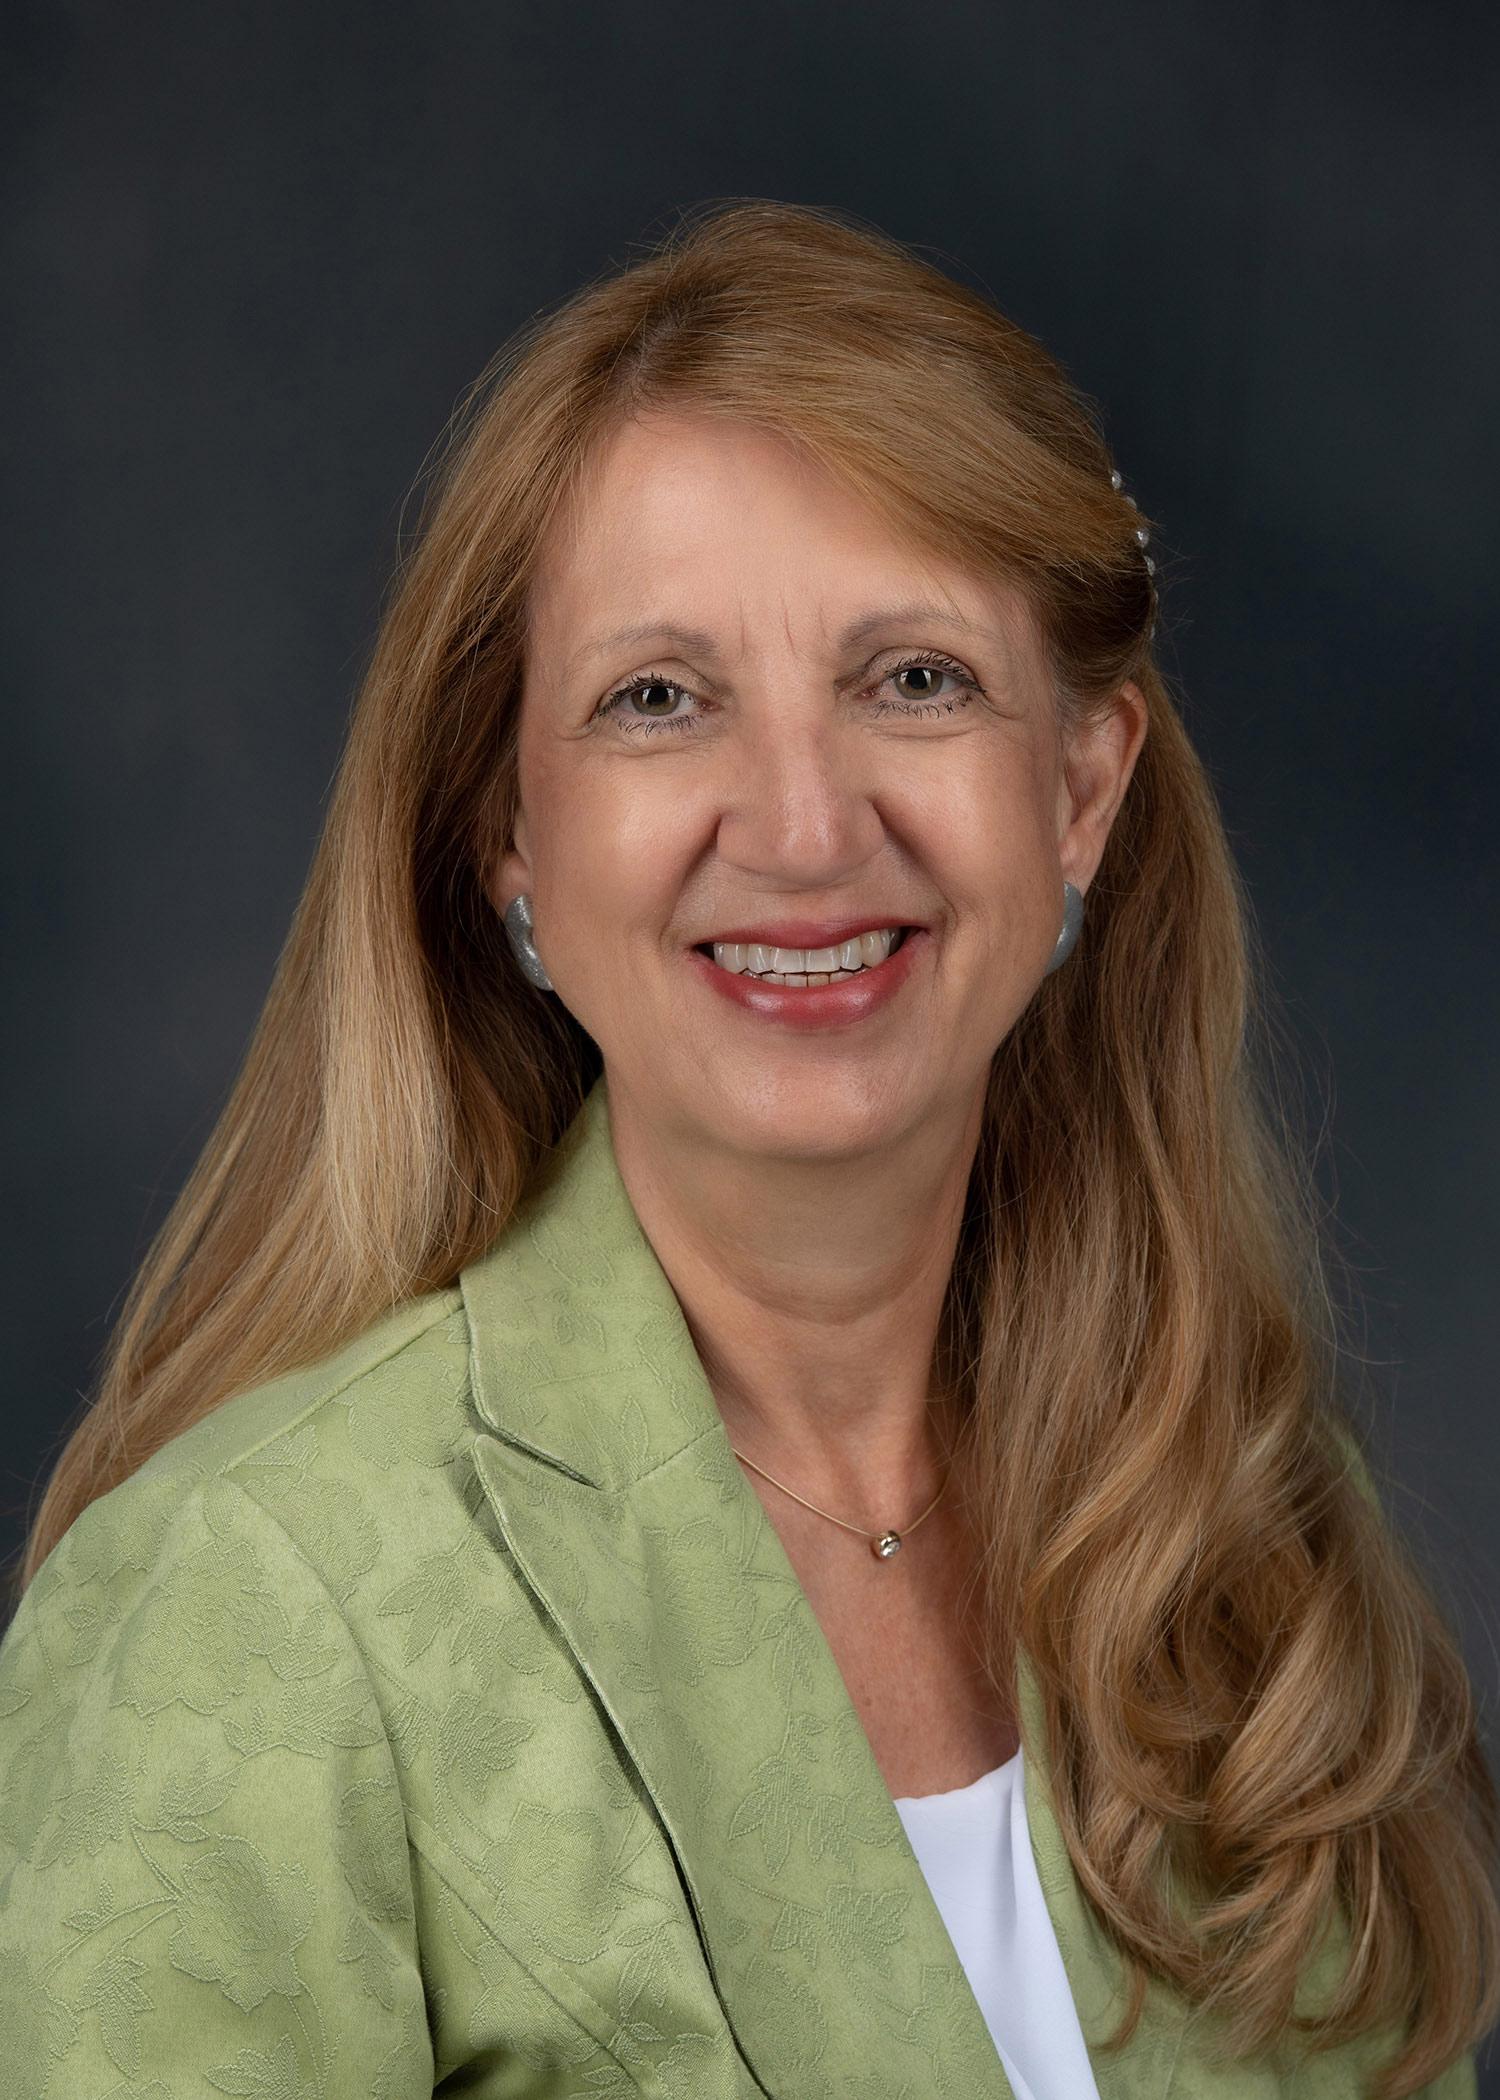 Denice Sheehan, Ph.D.